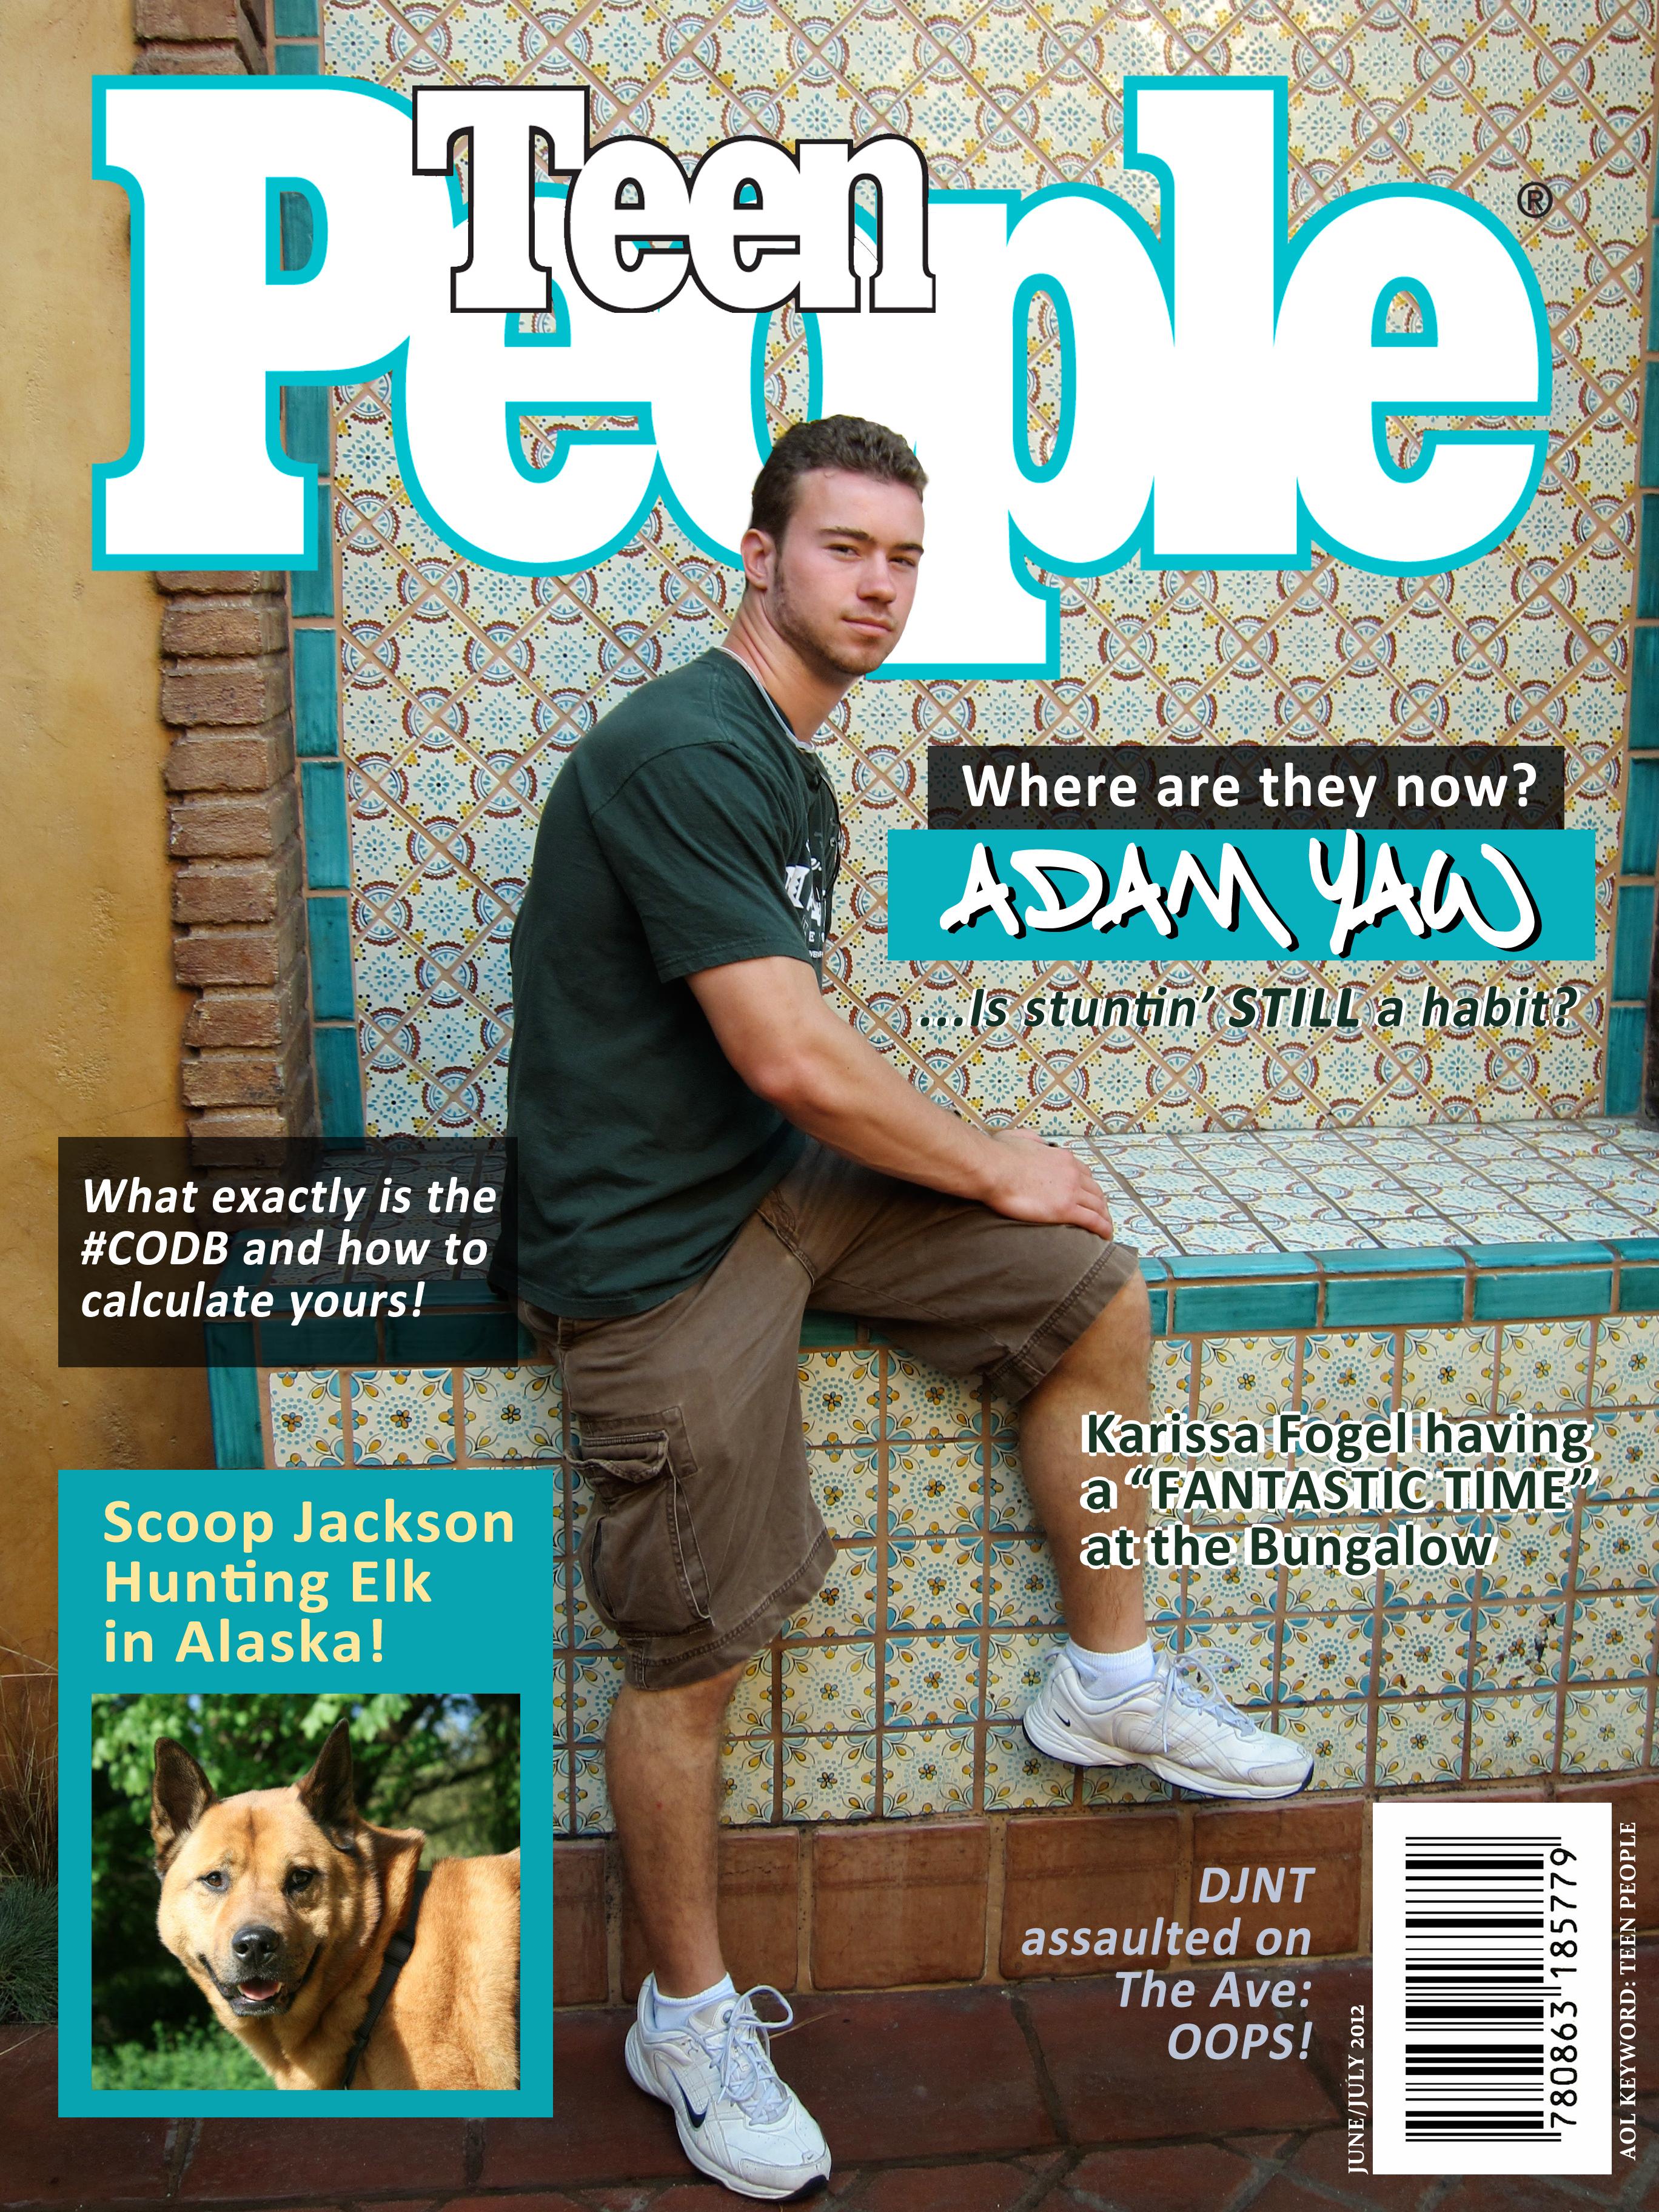 People Magazine Parody